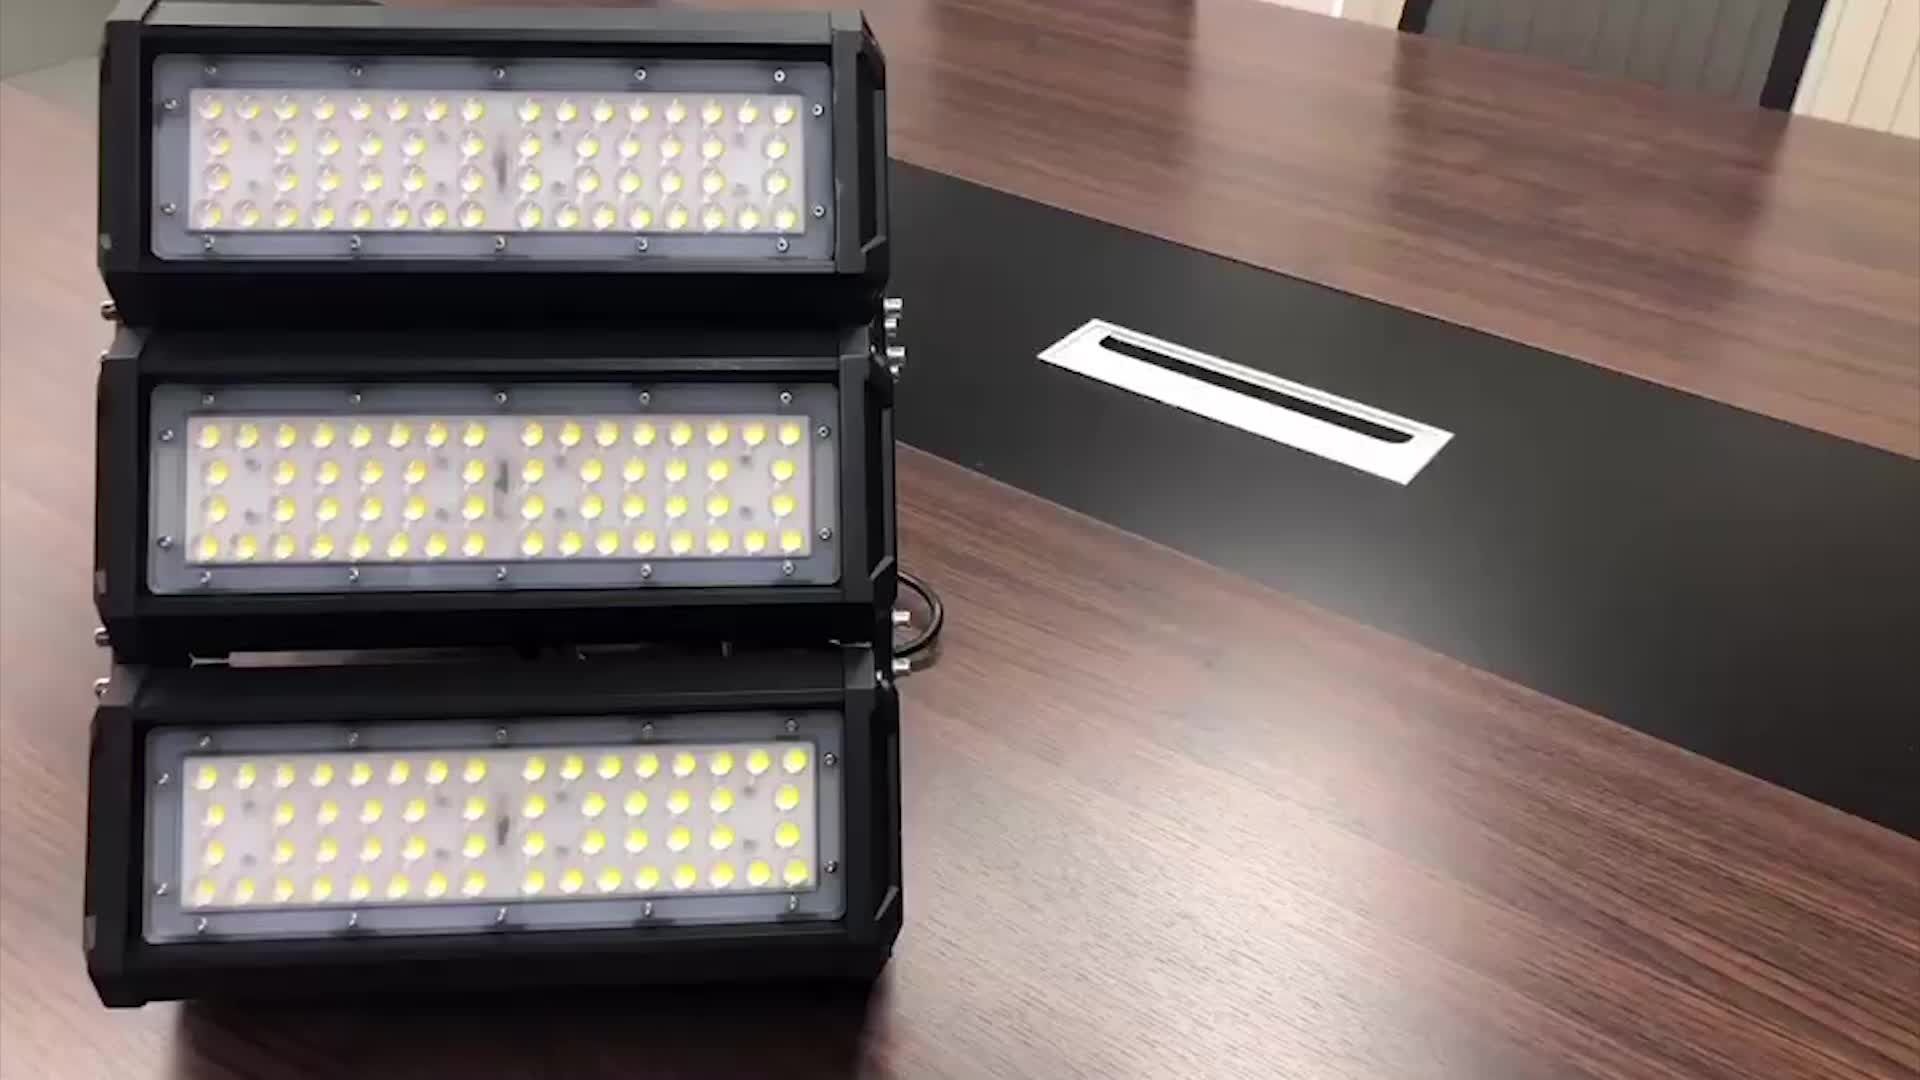 360W Premium vermeld 5 jaar garantie Brons 1000w LED spot light wit flood light FOB Referentie